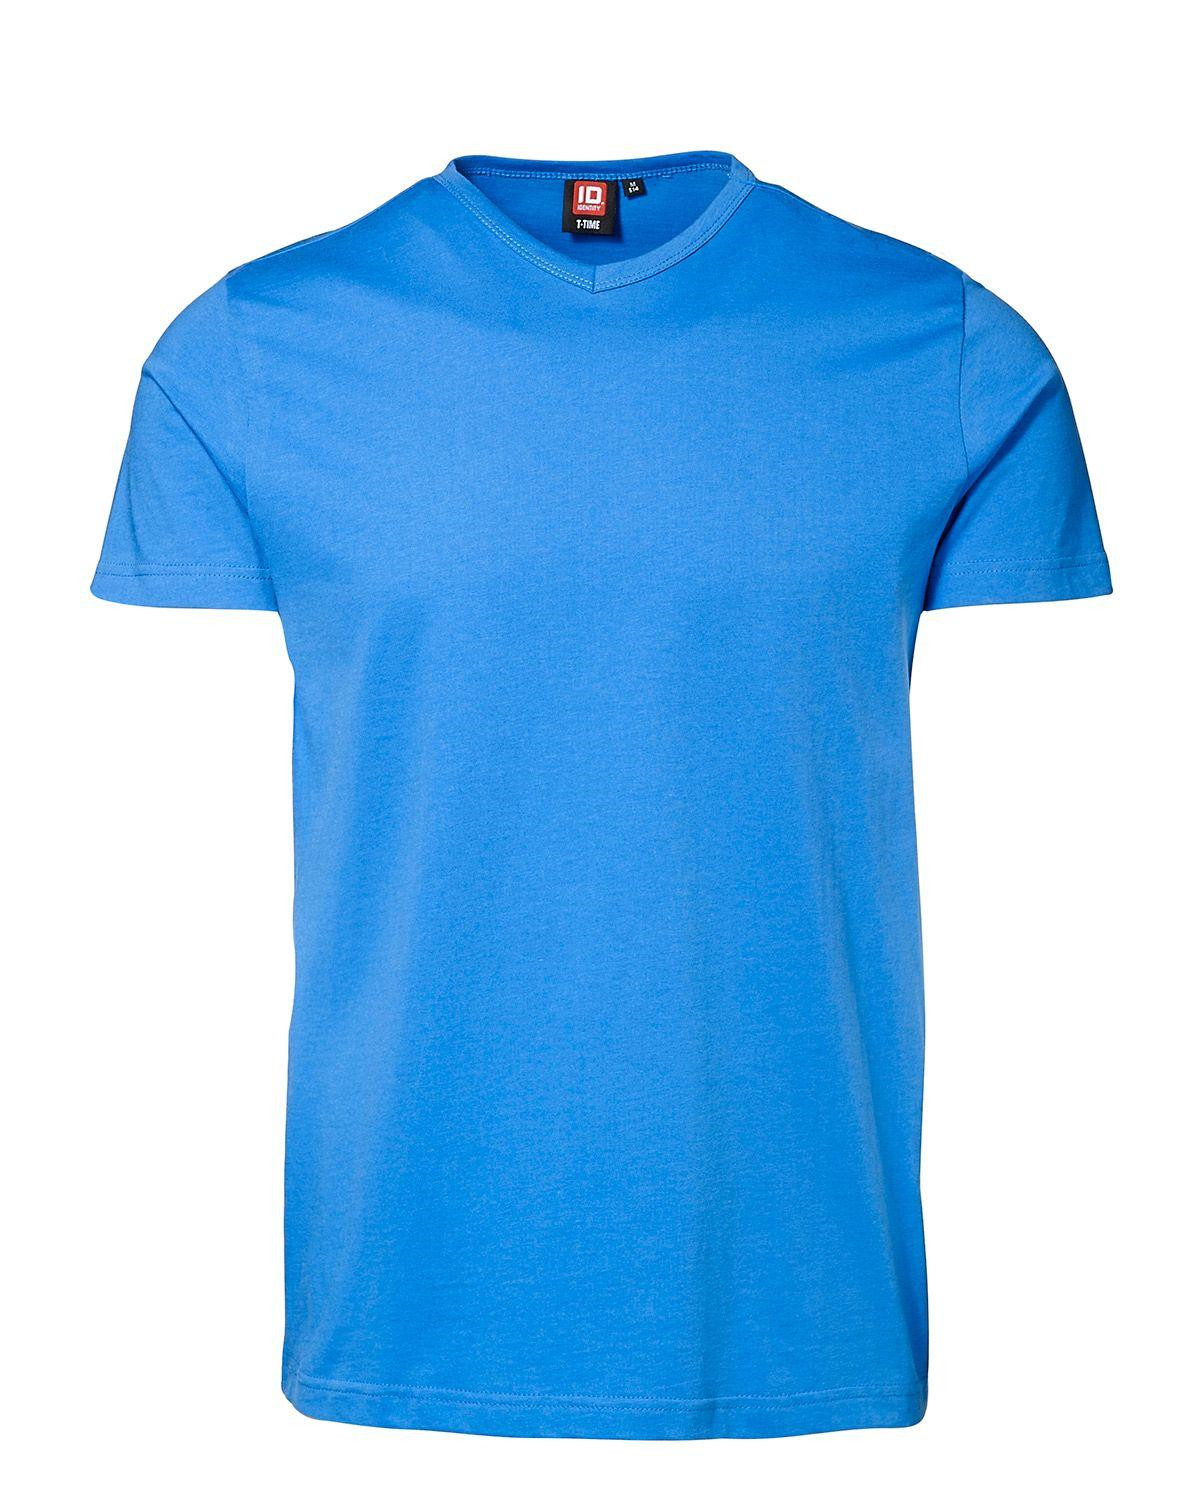 ID V-hals T-shirt (Azure, 2XL)